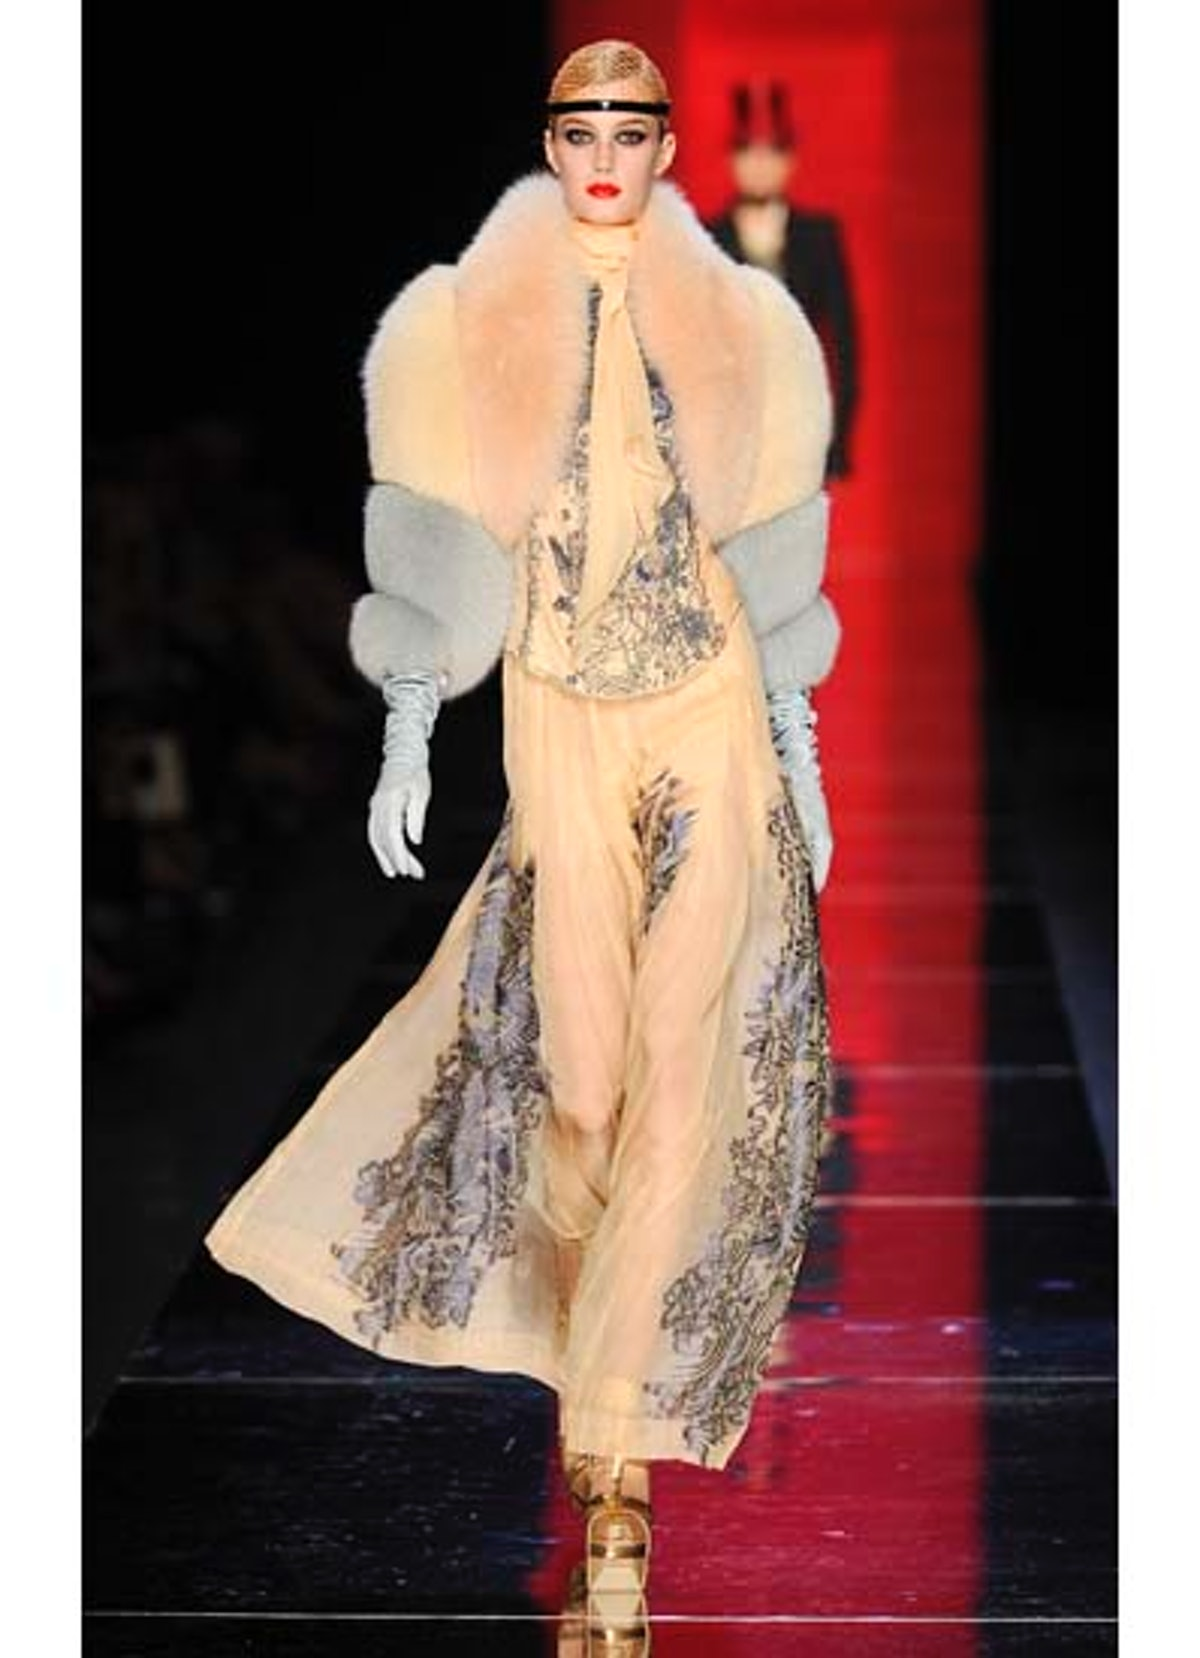 fass-jean-paul-gaultier-couture-2012-runway-24-v.jpg